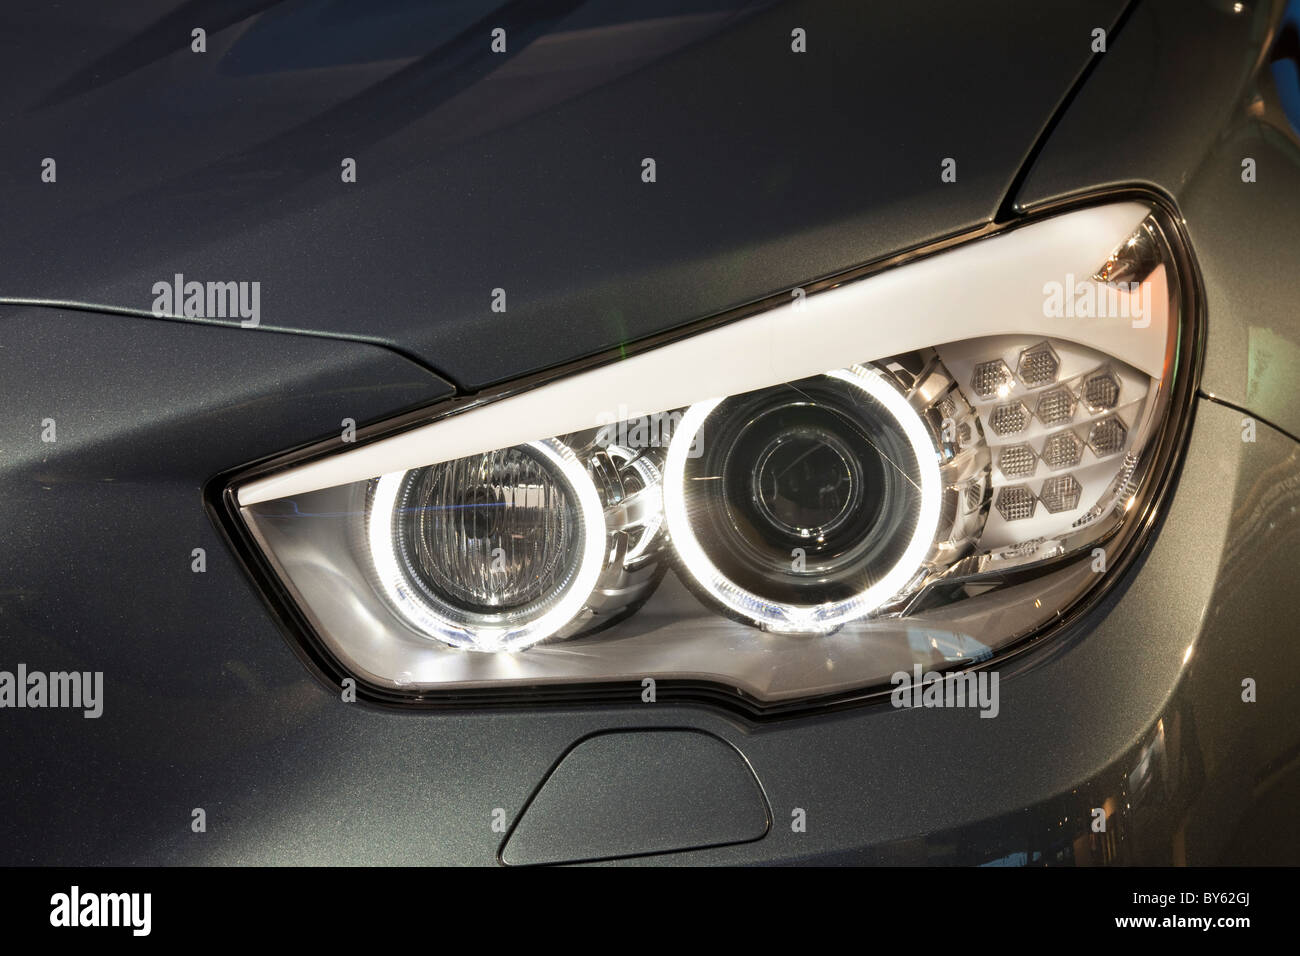 Faros LED en un automóvil BMW Imagen De Stock